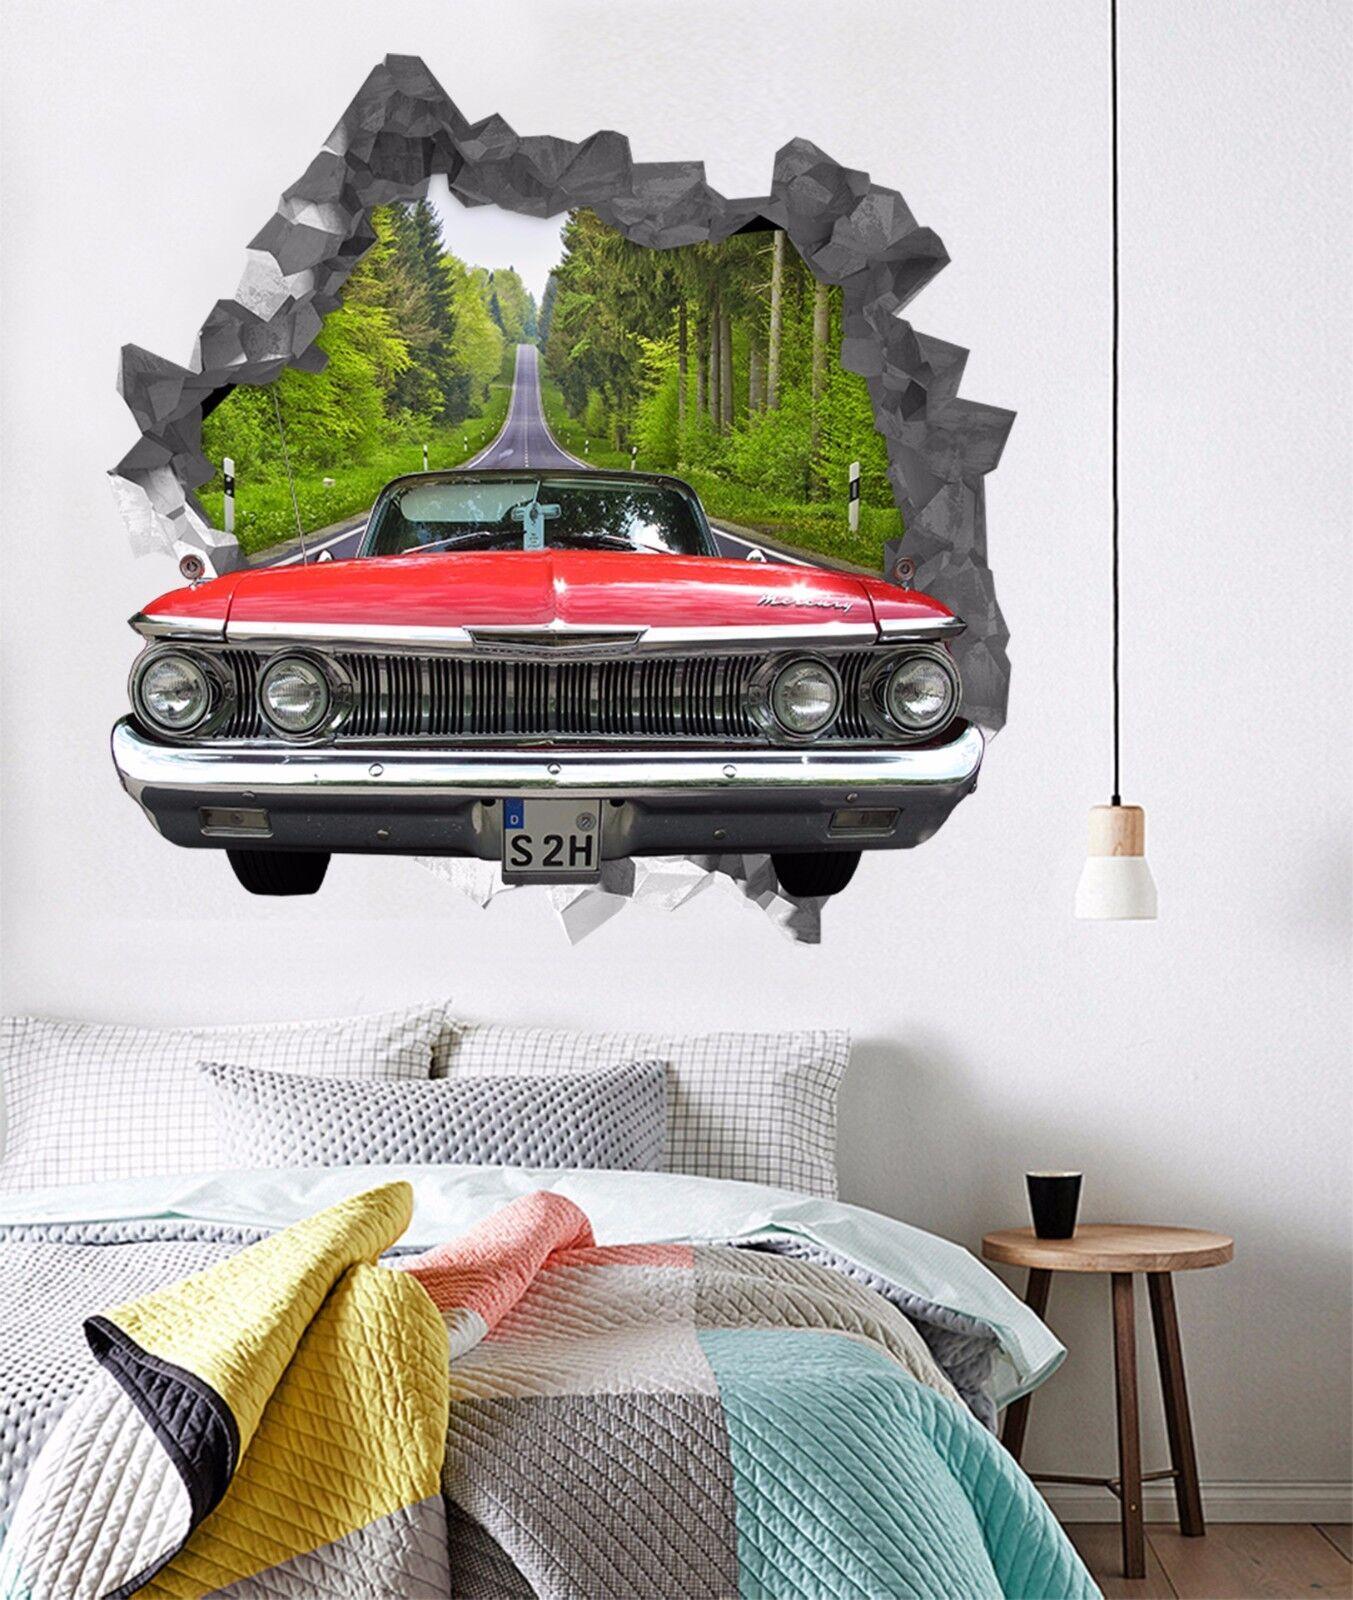 3D Rotes Auto 778 Mauer Murals Mauer Aufklebe Decal Durchbruch AJ WALLPAPER DE